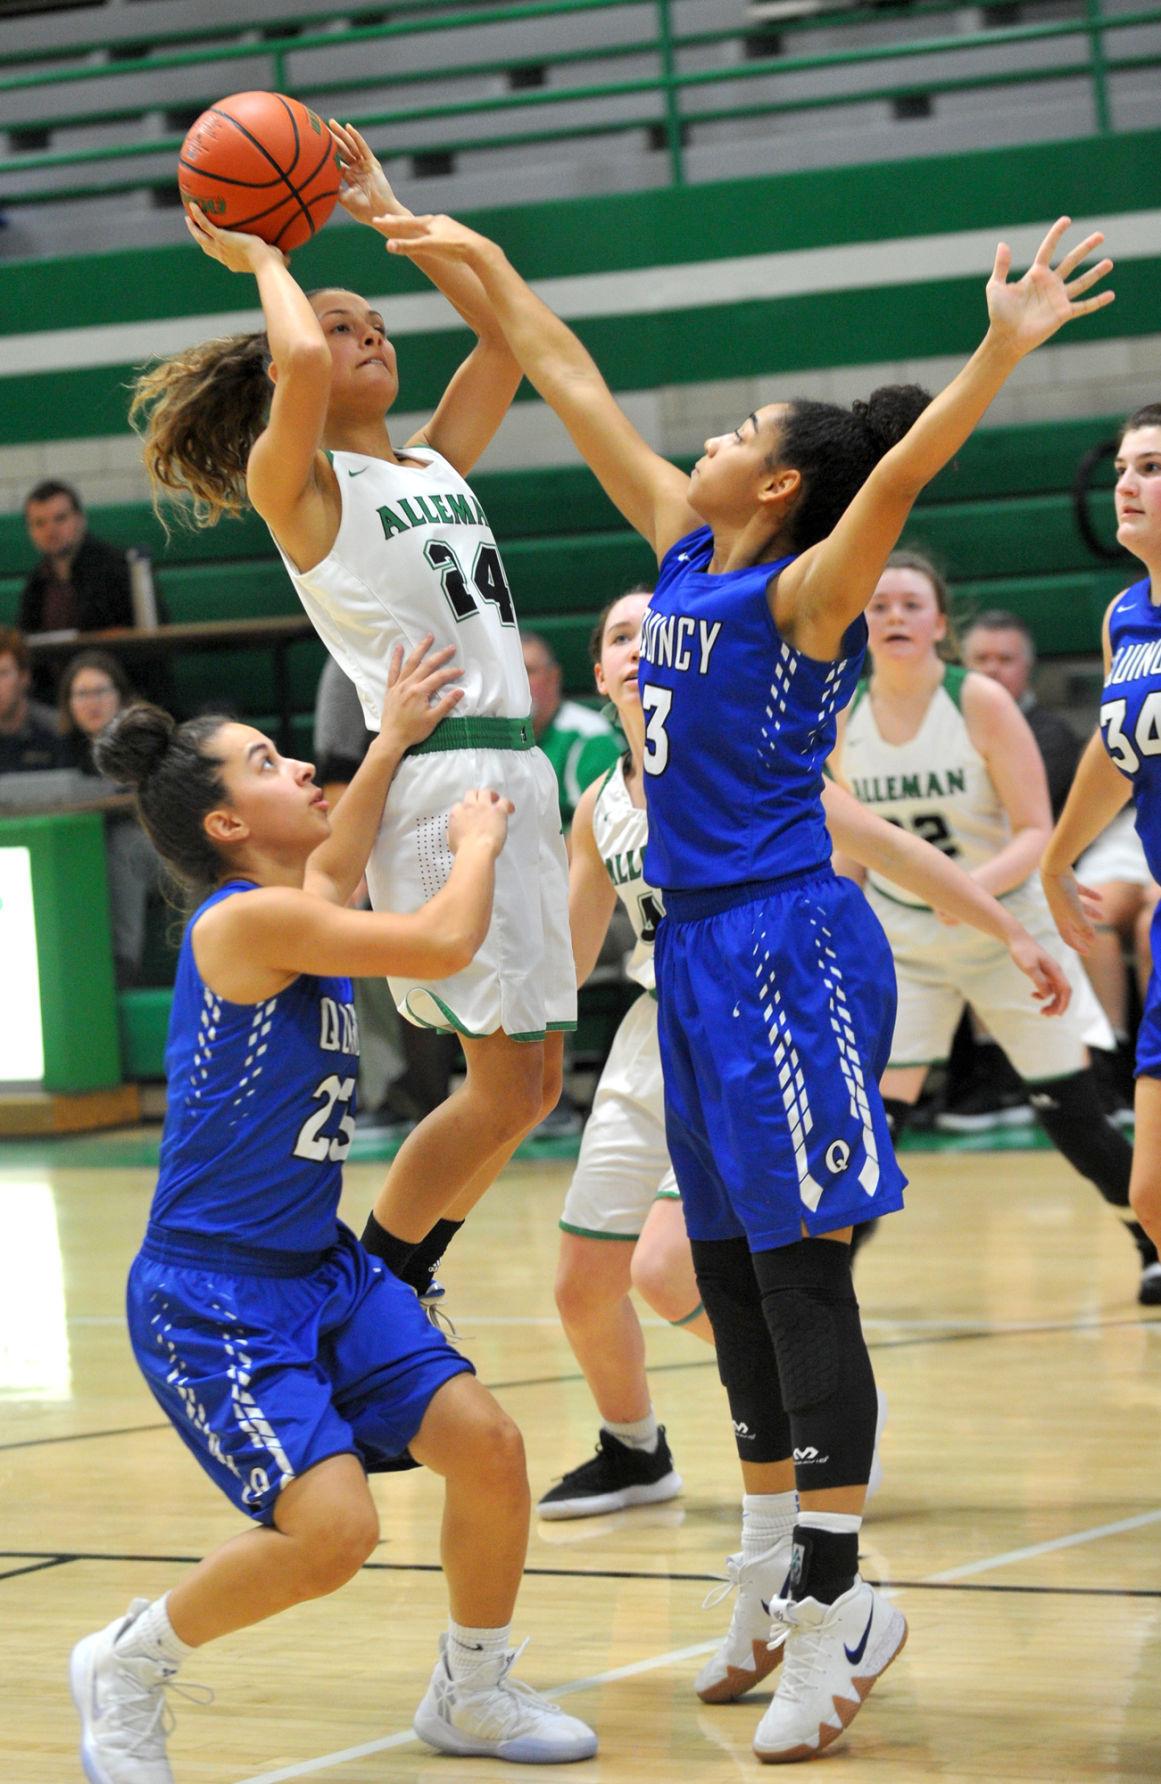 Alleman vs Quincy girls basketball